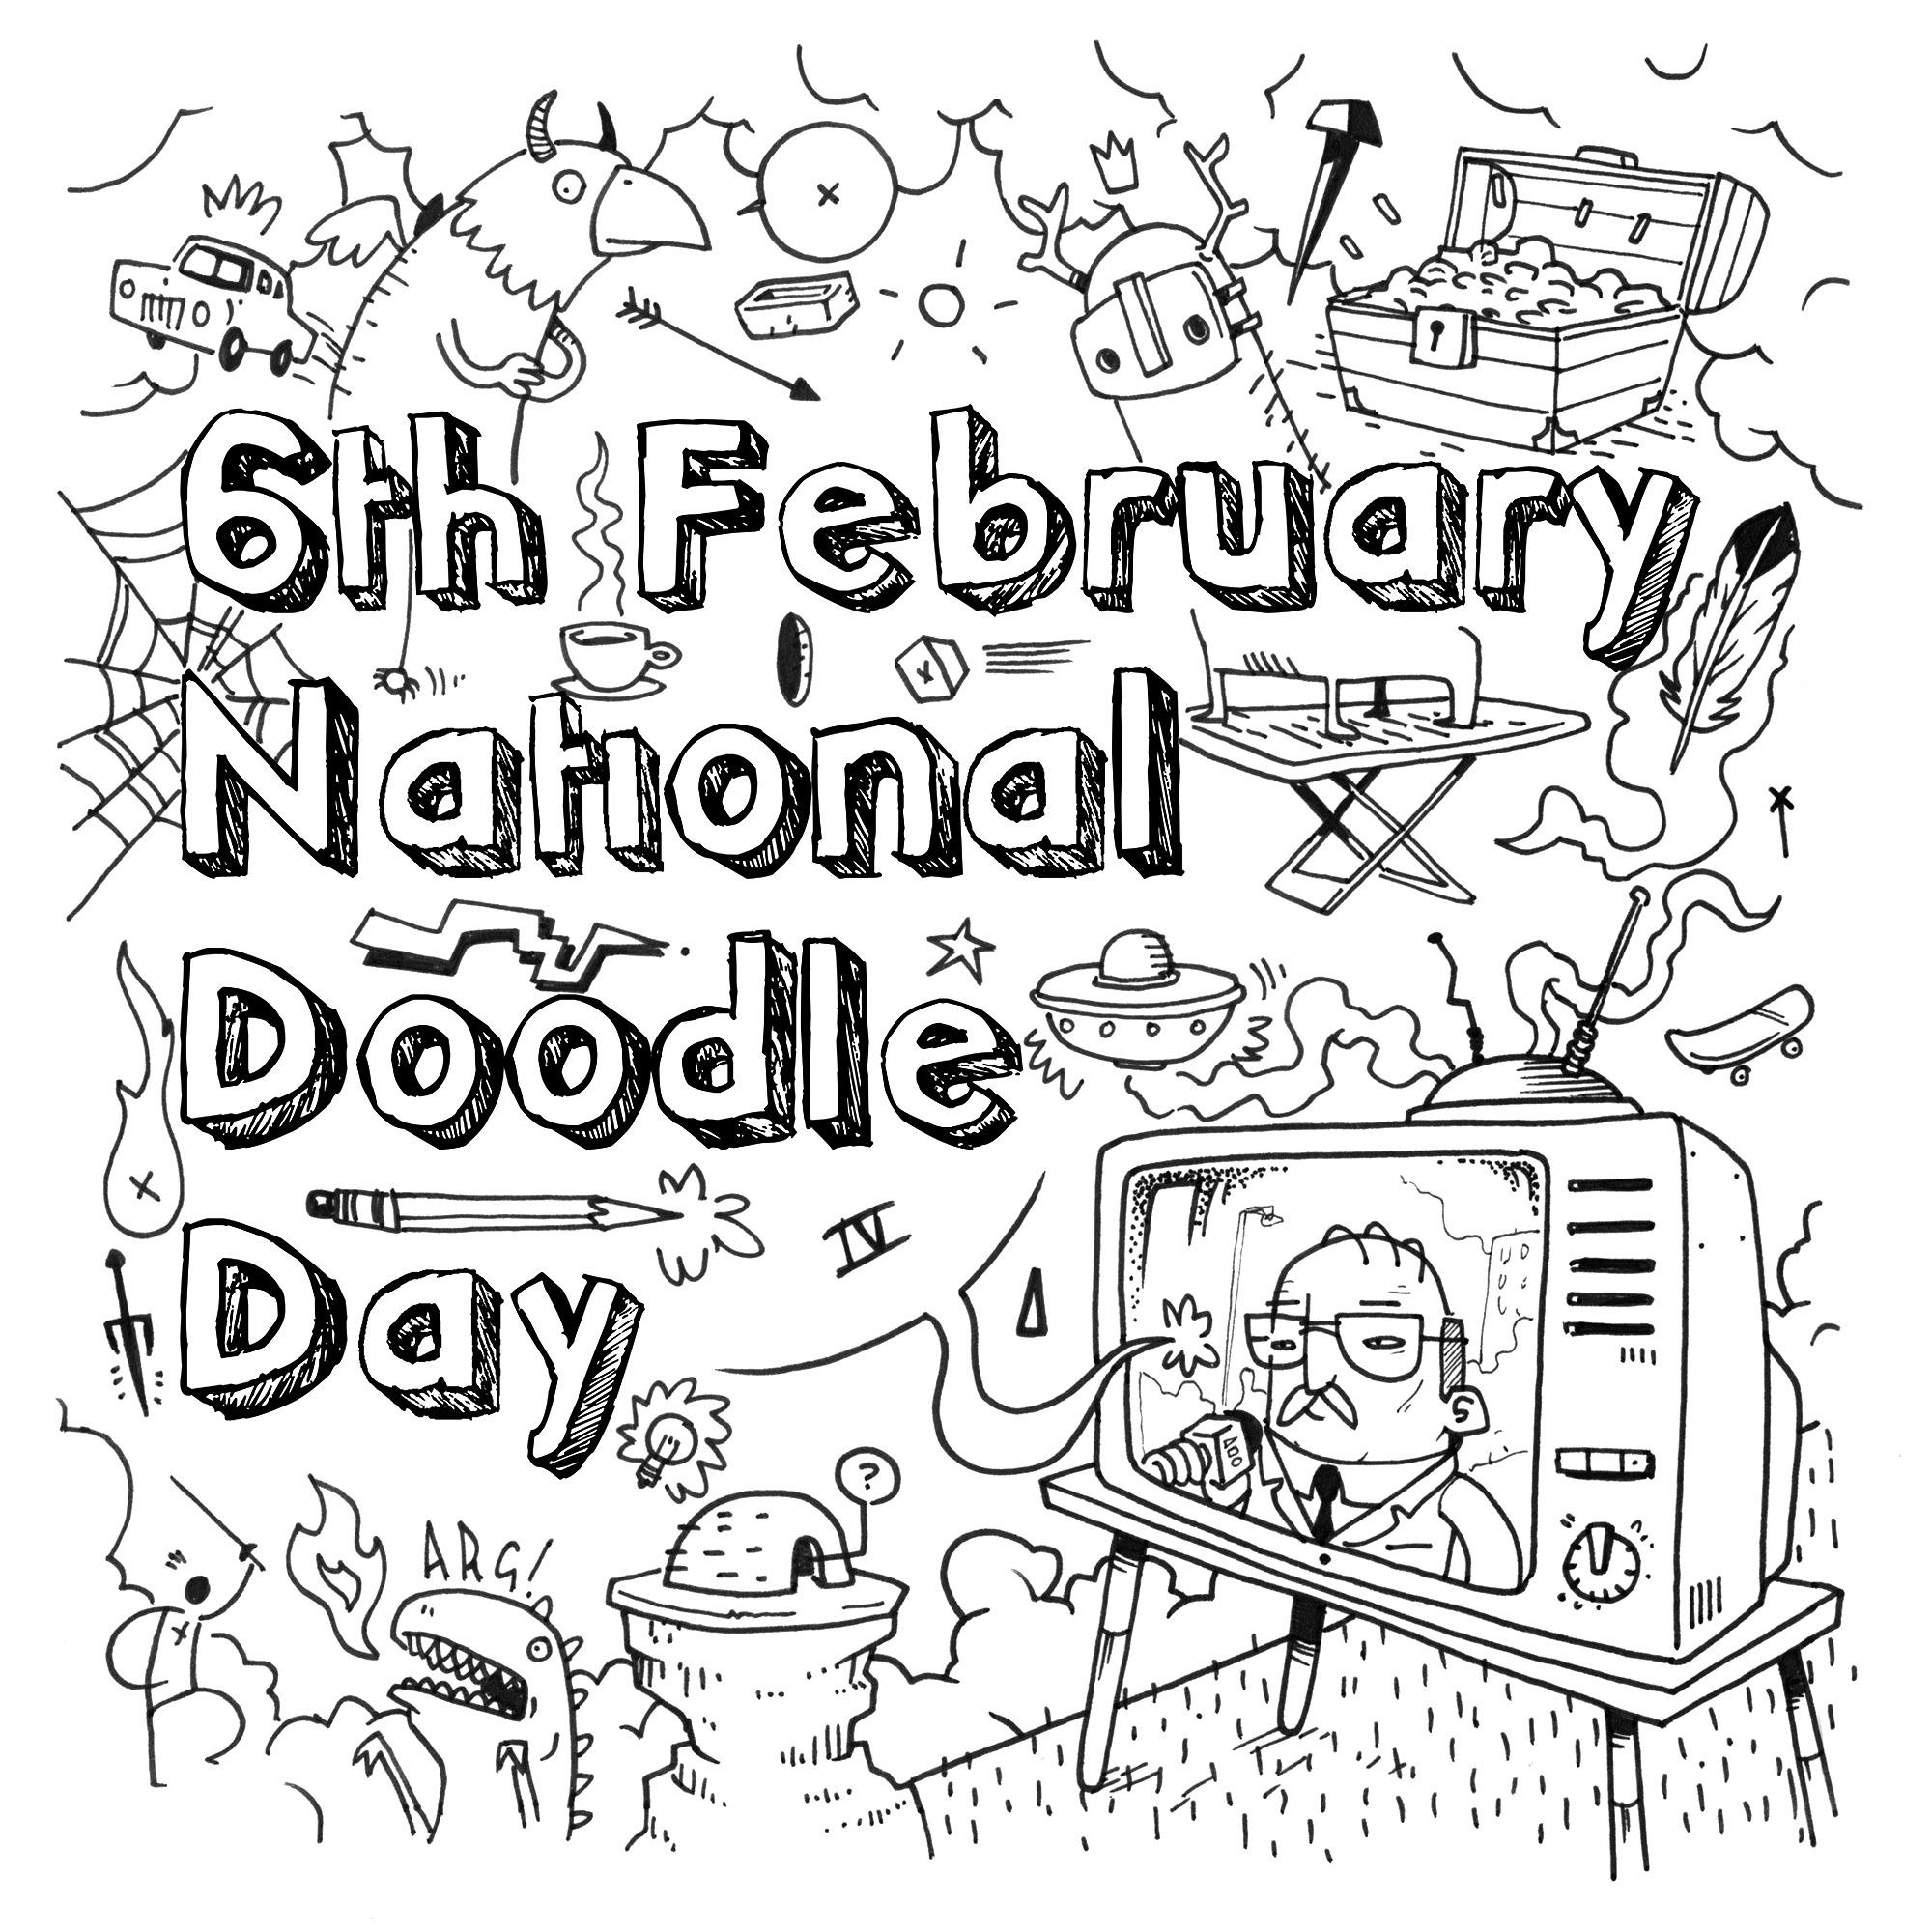 Doodle day banner square.jpg